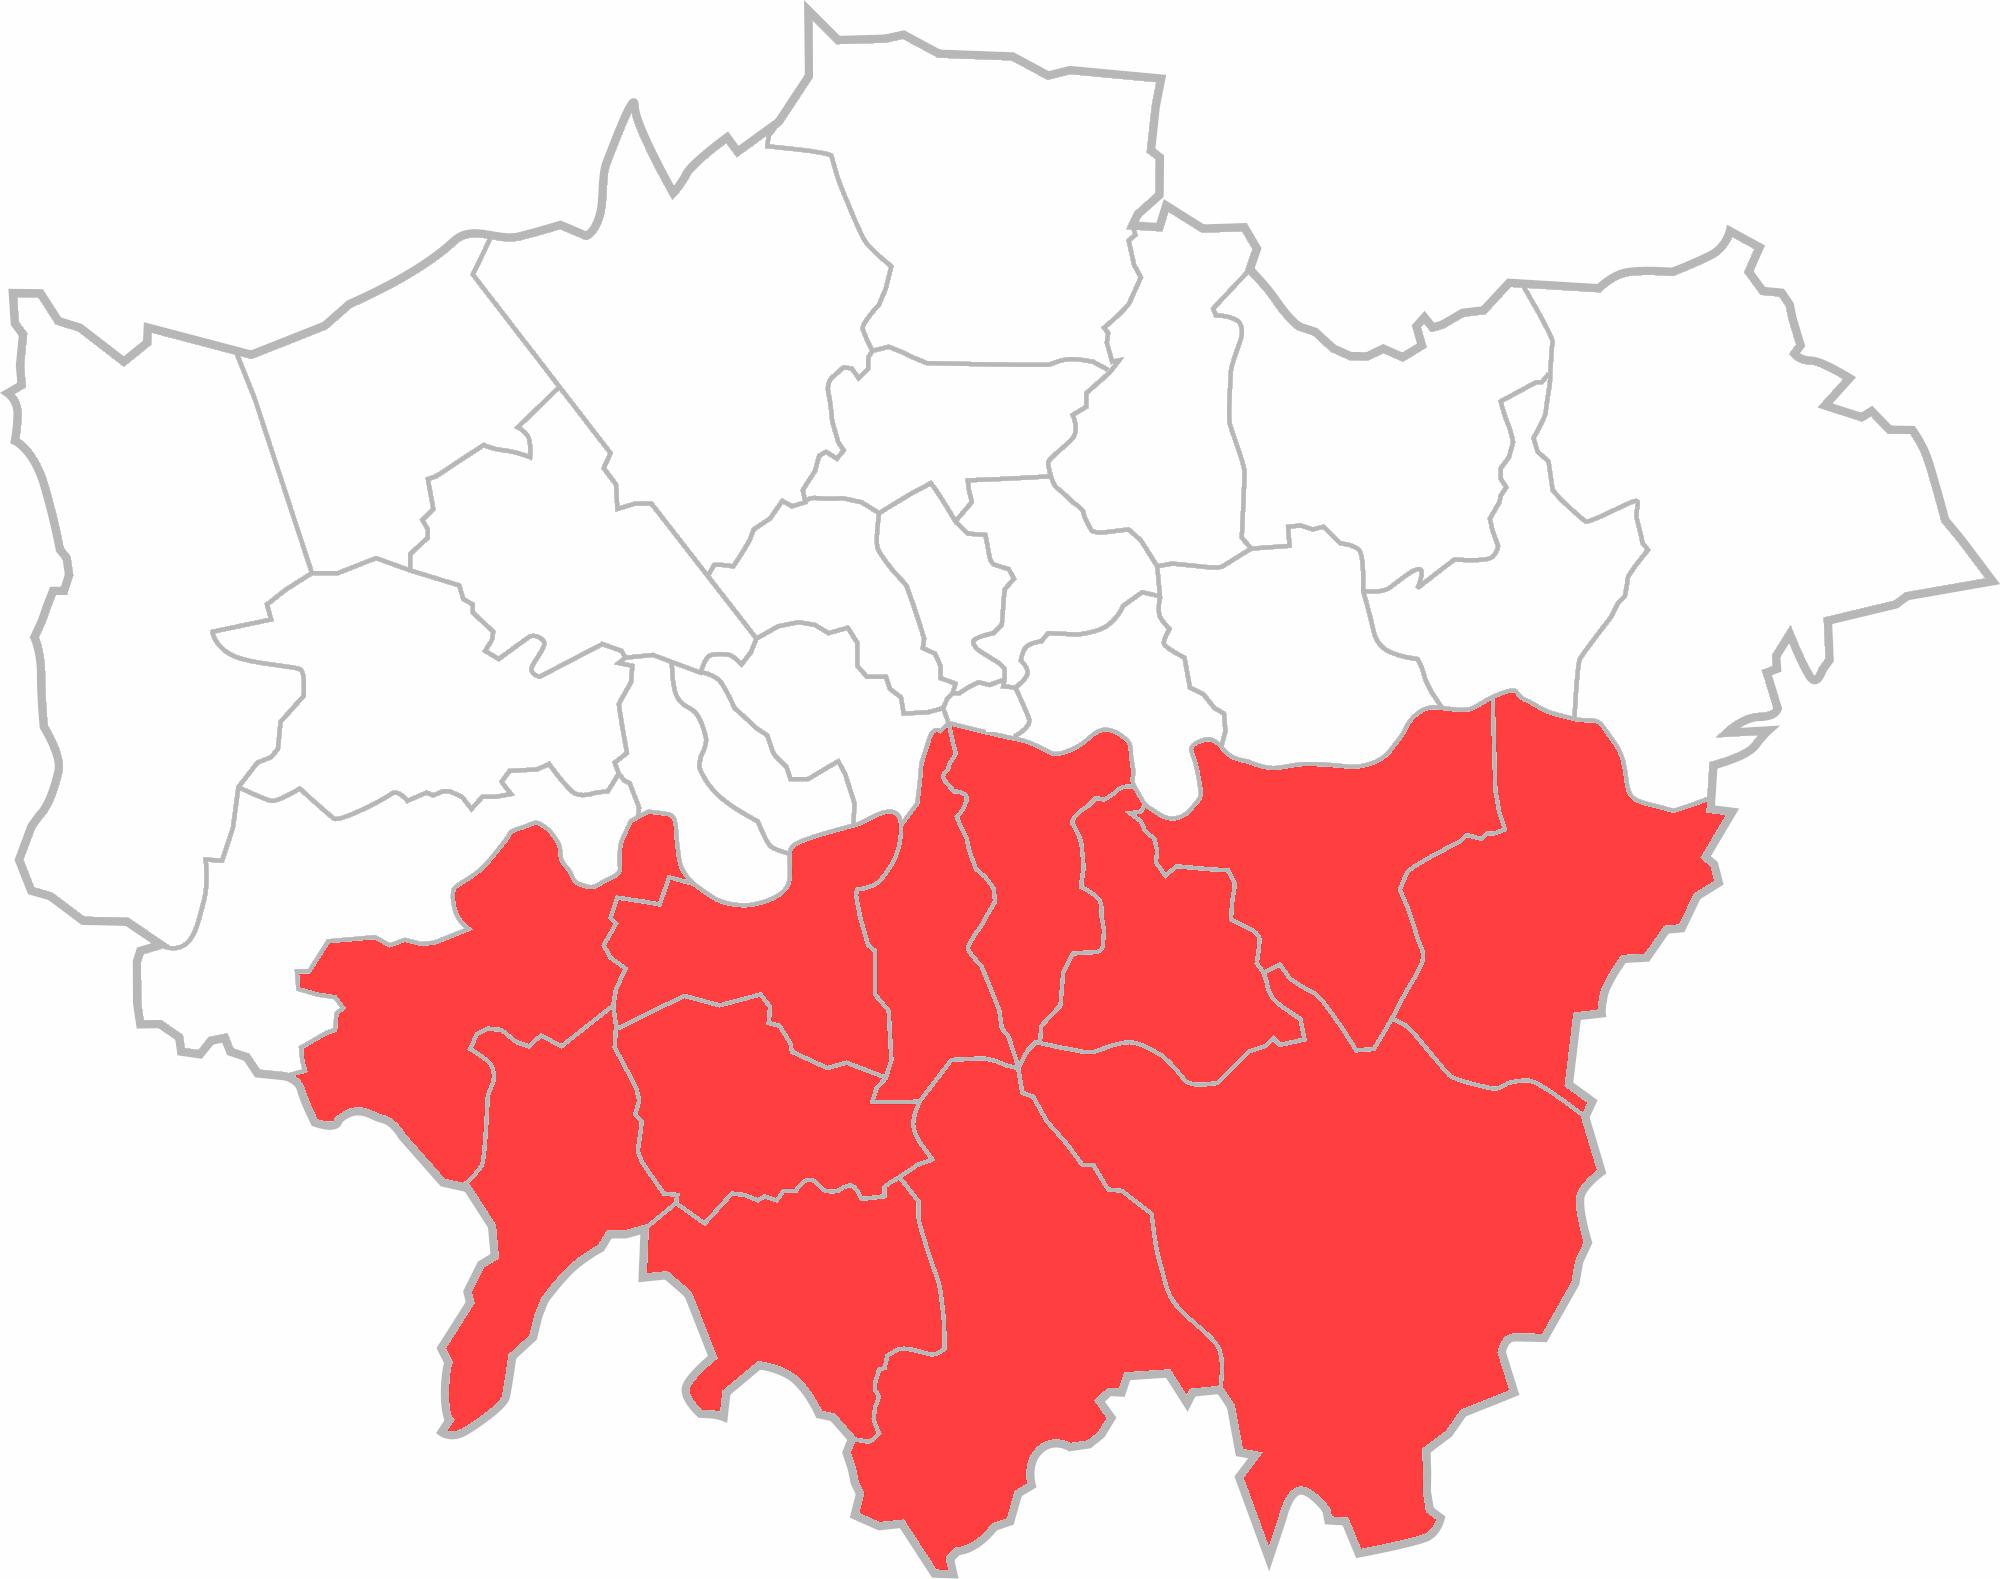 South London Map.File South London Png Wikipedia